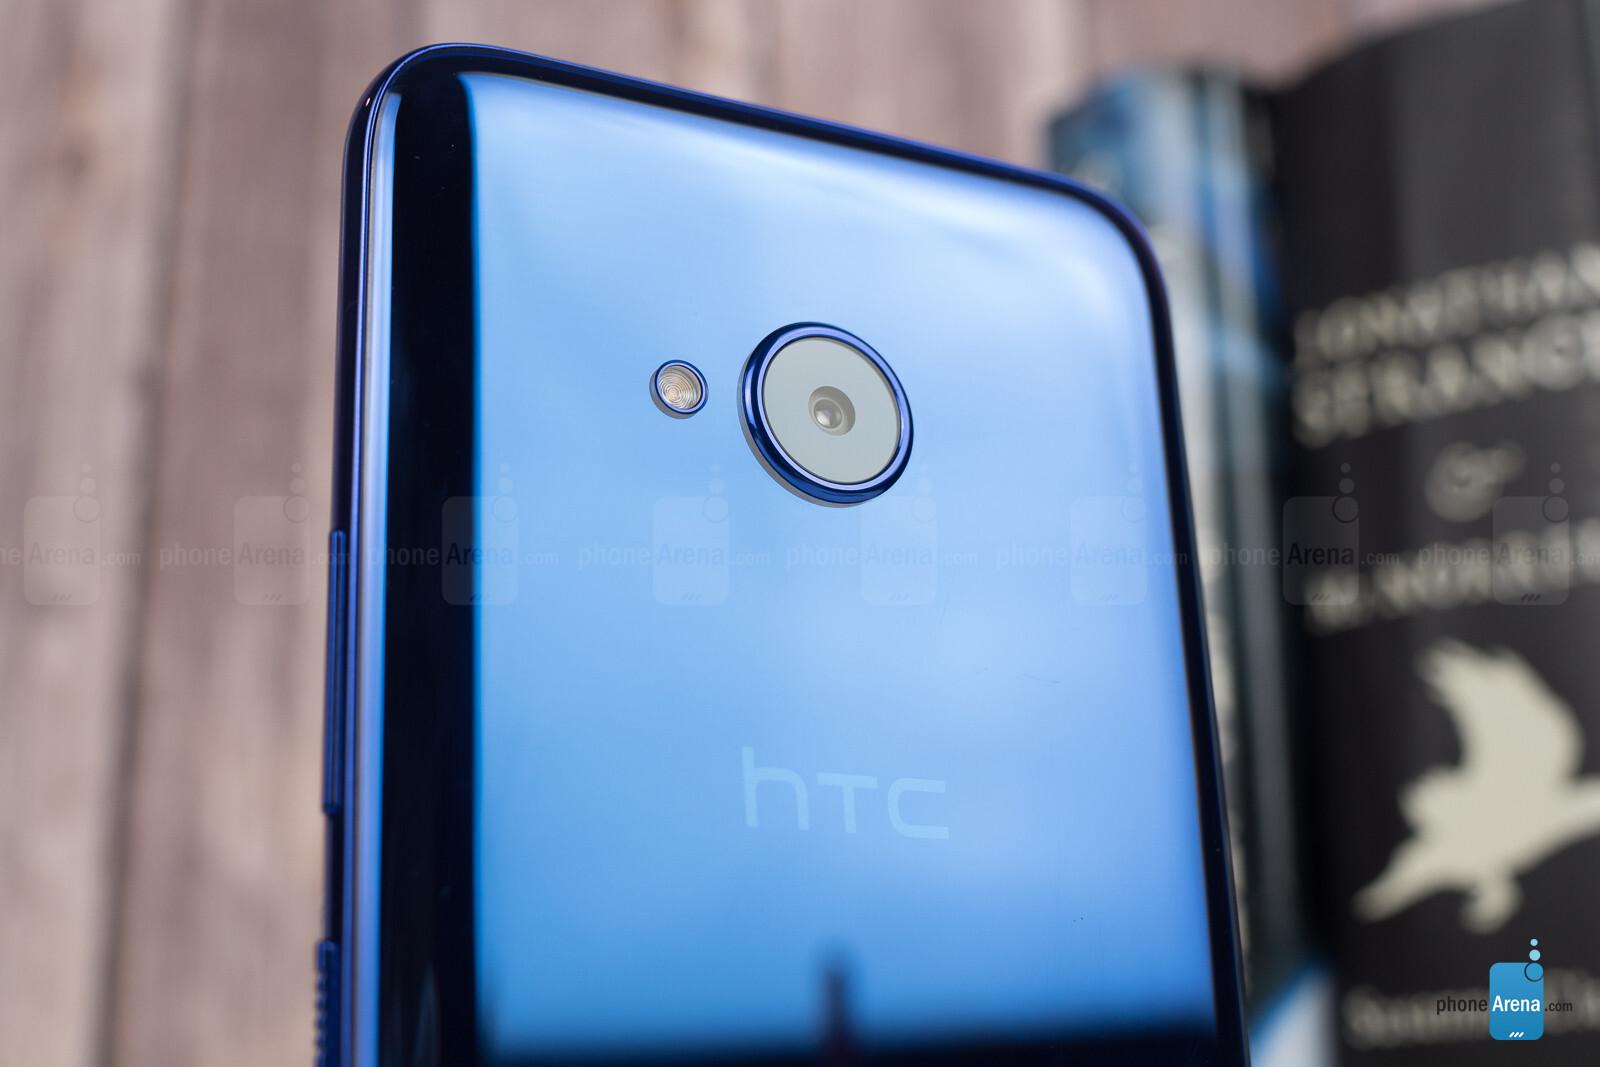 HTC U11 life Review - Camera and Multimedia - PhoneArena